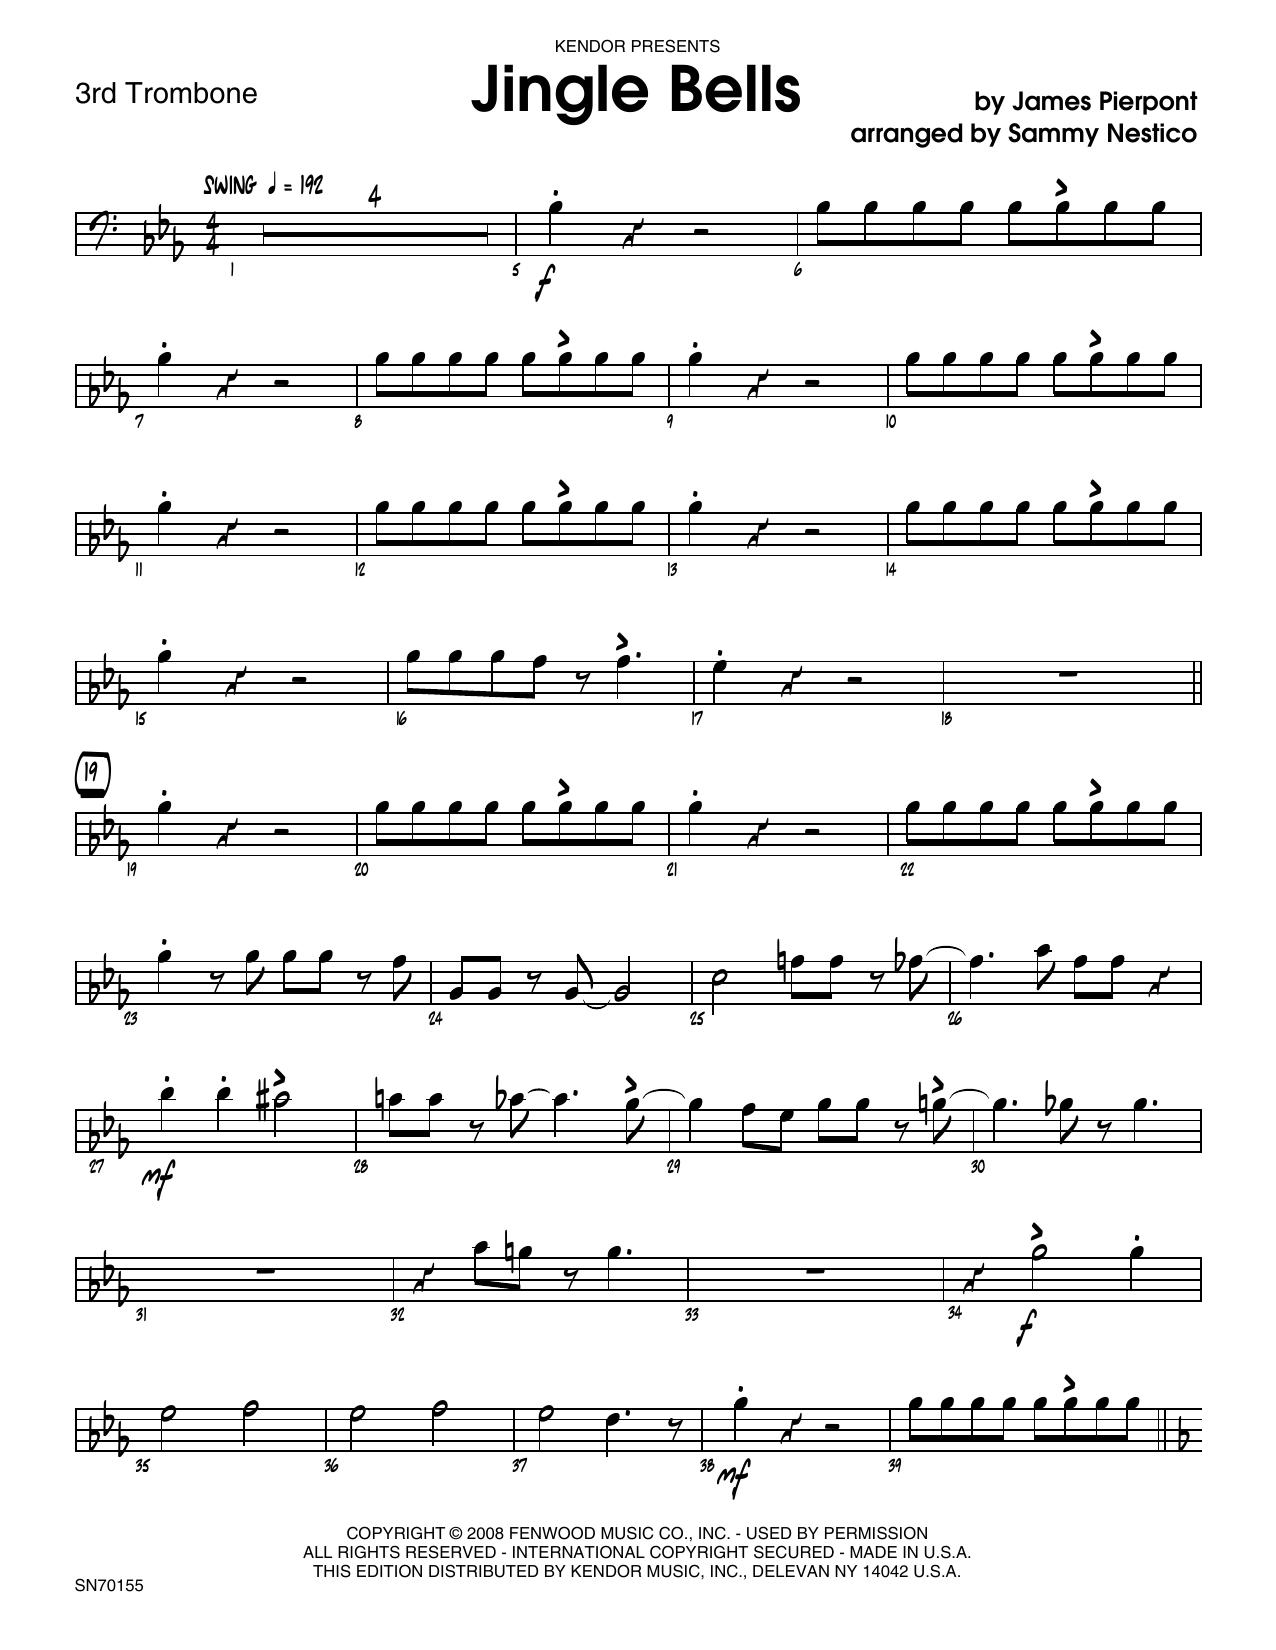 Jingle Bells - 3rd Trombone Sheet Music